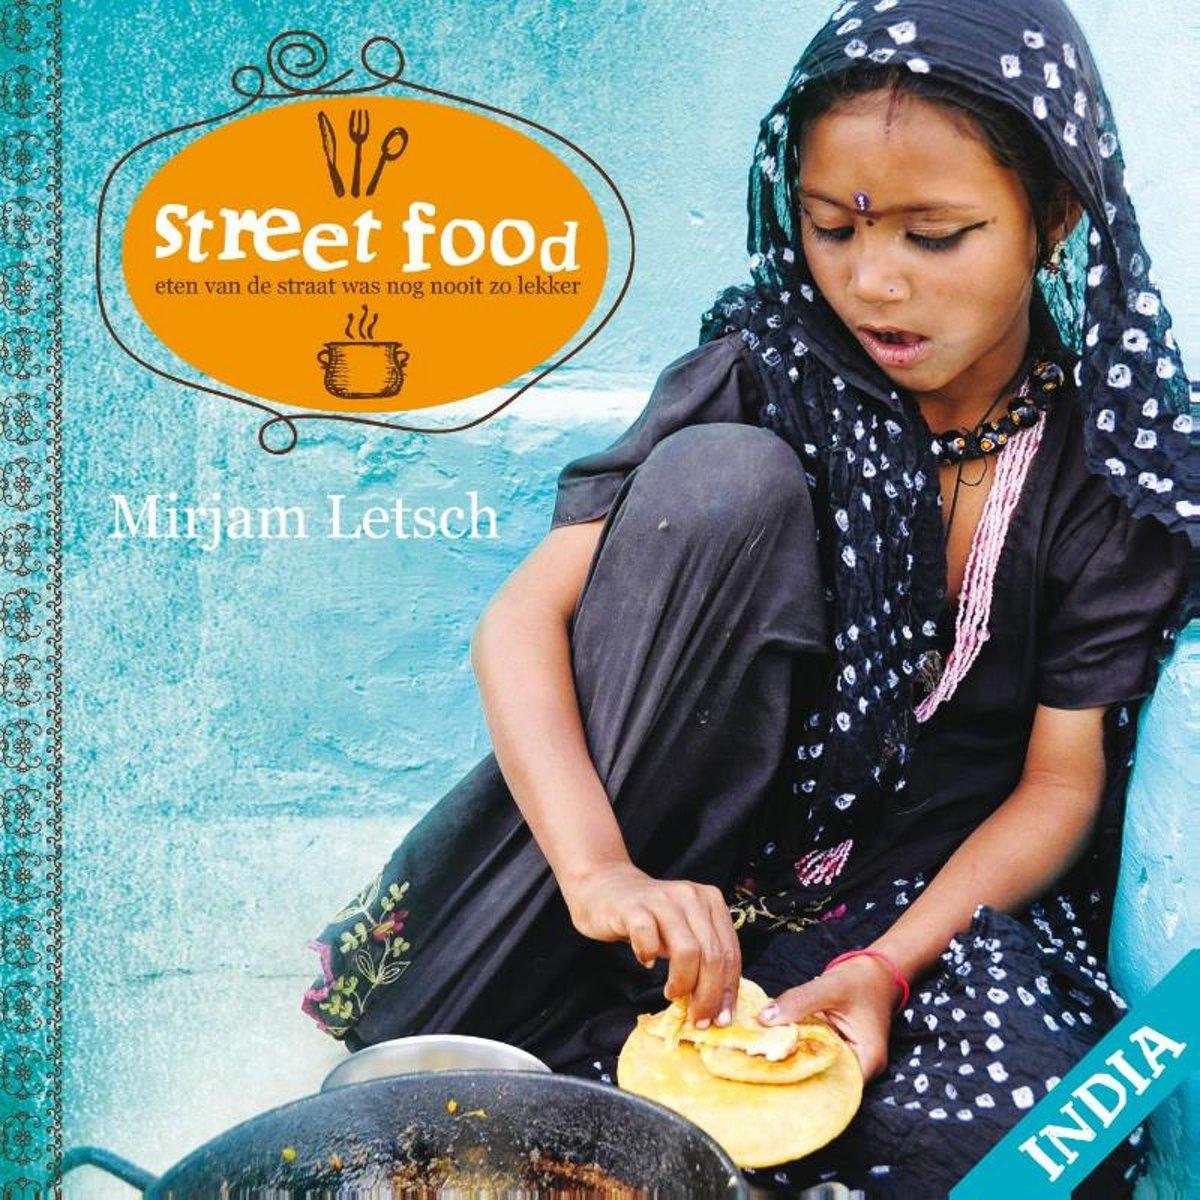 Street Food India 9789081962902 Mirjam Letsch Letsch & De Clercq Visuals   Culinaire reisgidsen India